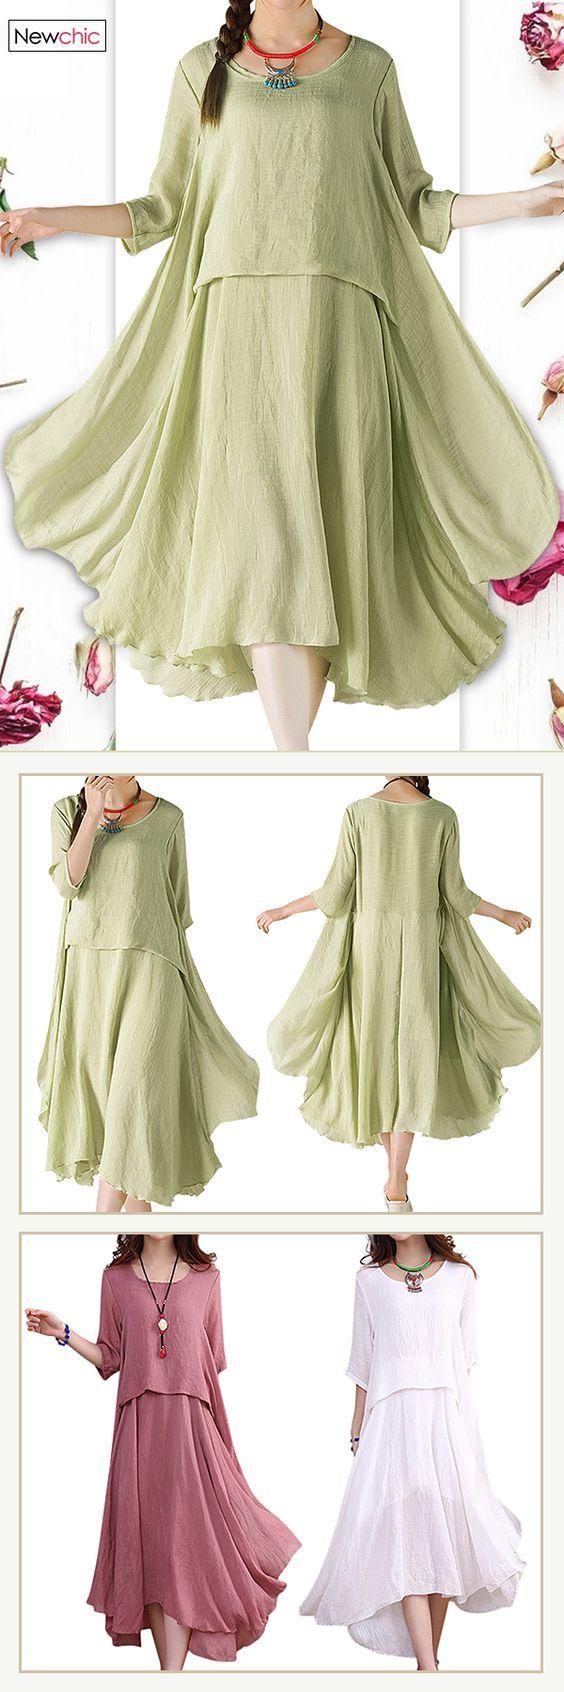 US$ 19.24 O-NEWE Elegant Solid 3/4 Sleeve Ruffled Irregular Dress For Women